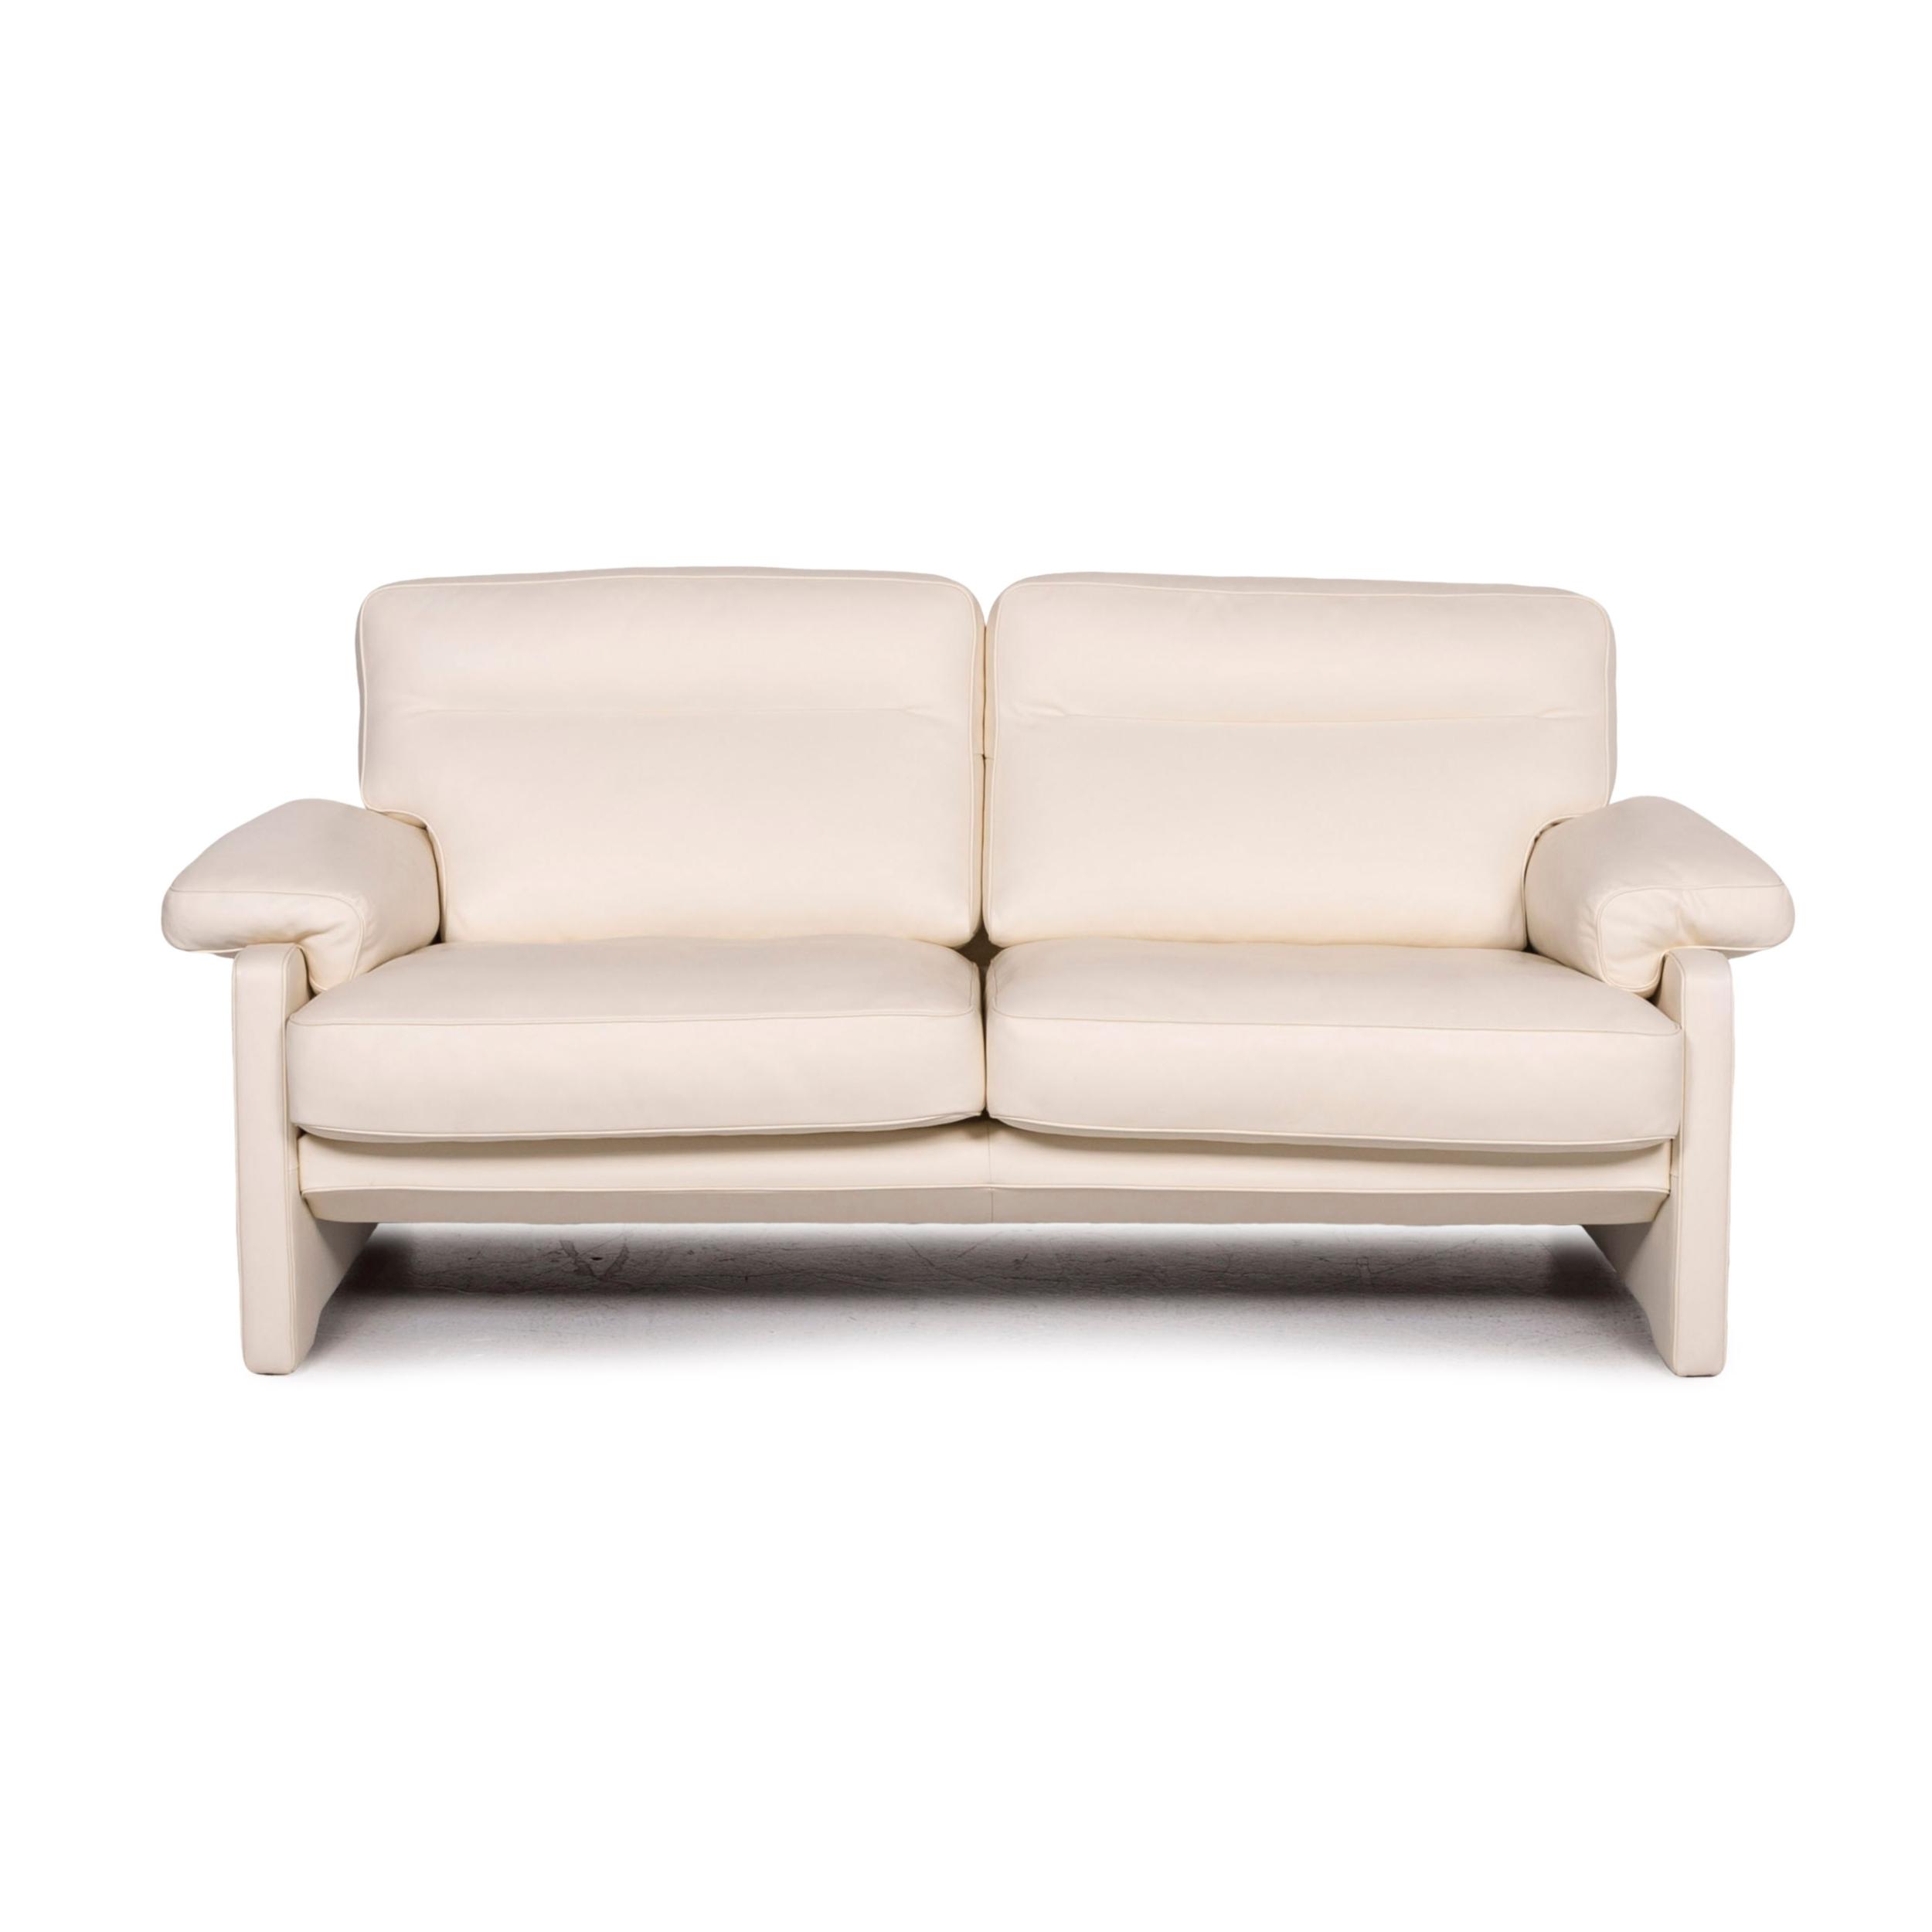 Full Size of De Sede Furniture For Sale Couch Gebraucht Sofa Uk Sessel Preise Endless Ds 600 By Bi Sleeper 70 Leder Creme Zweisitzer 12163 Revive Lederpflege Mit Sofa De Sede Sofa